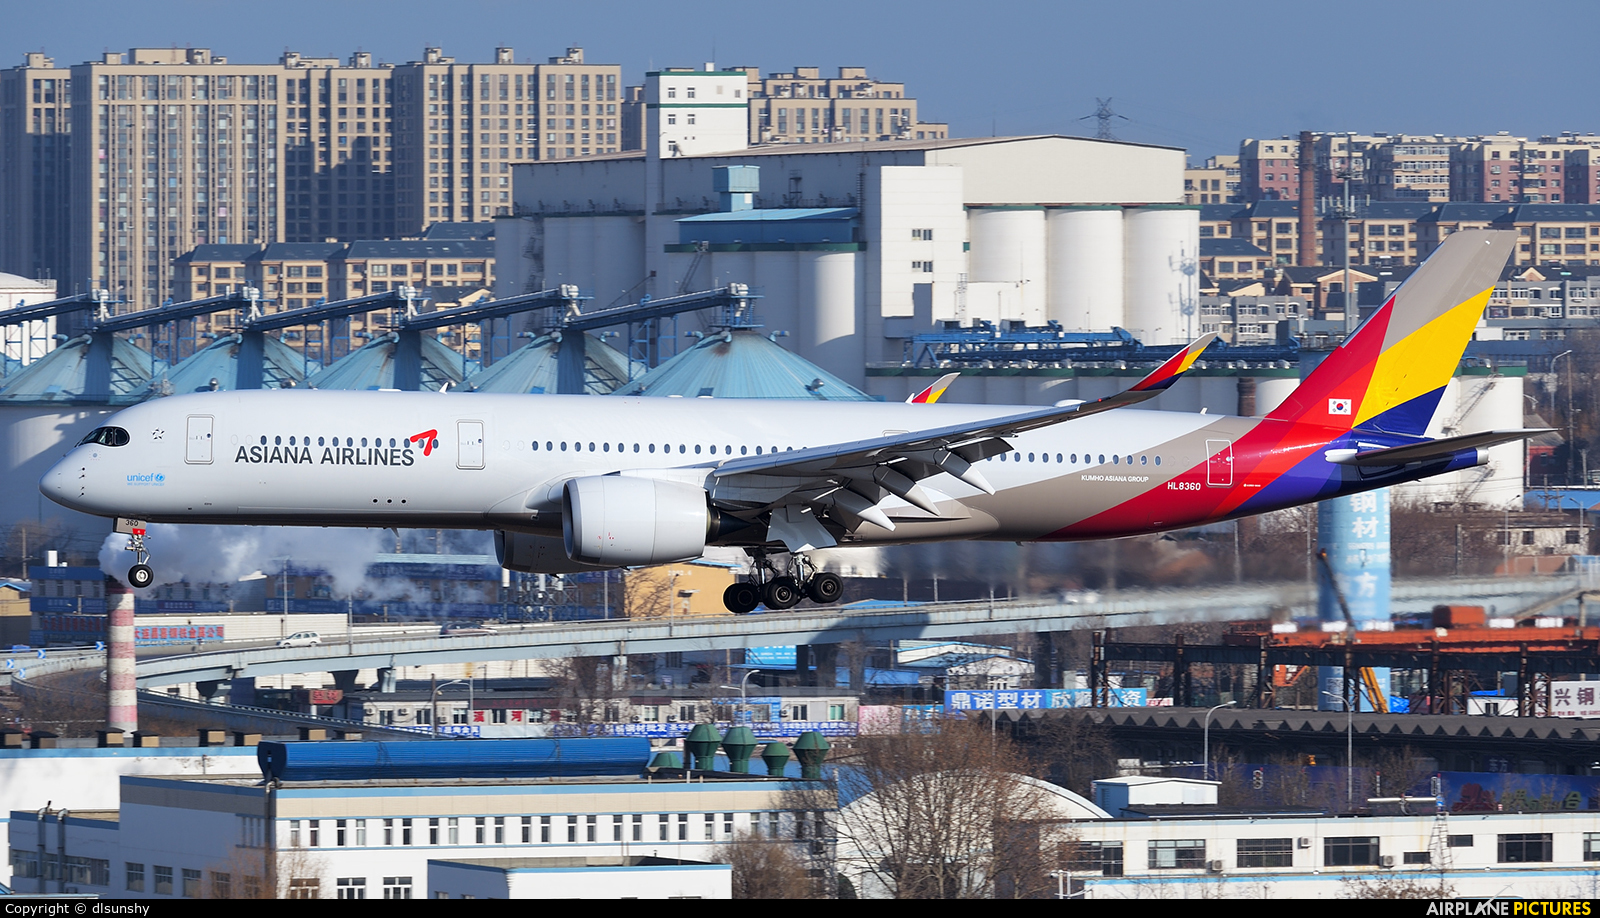 Asiana Airlines HL8360 aircraft at Dalian Zhoushuizi Int'l